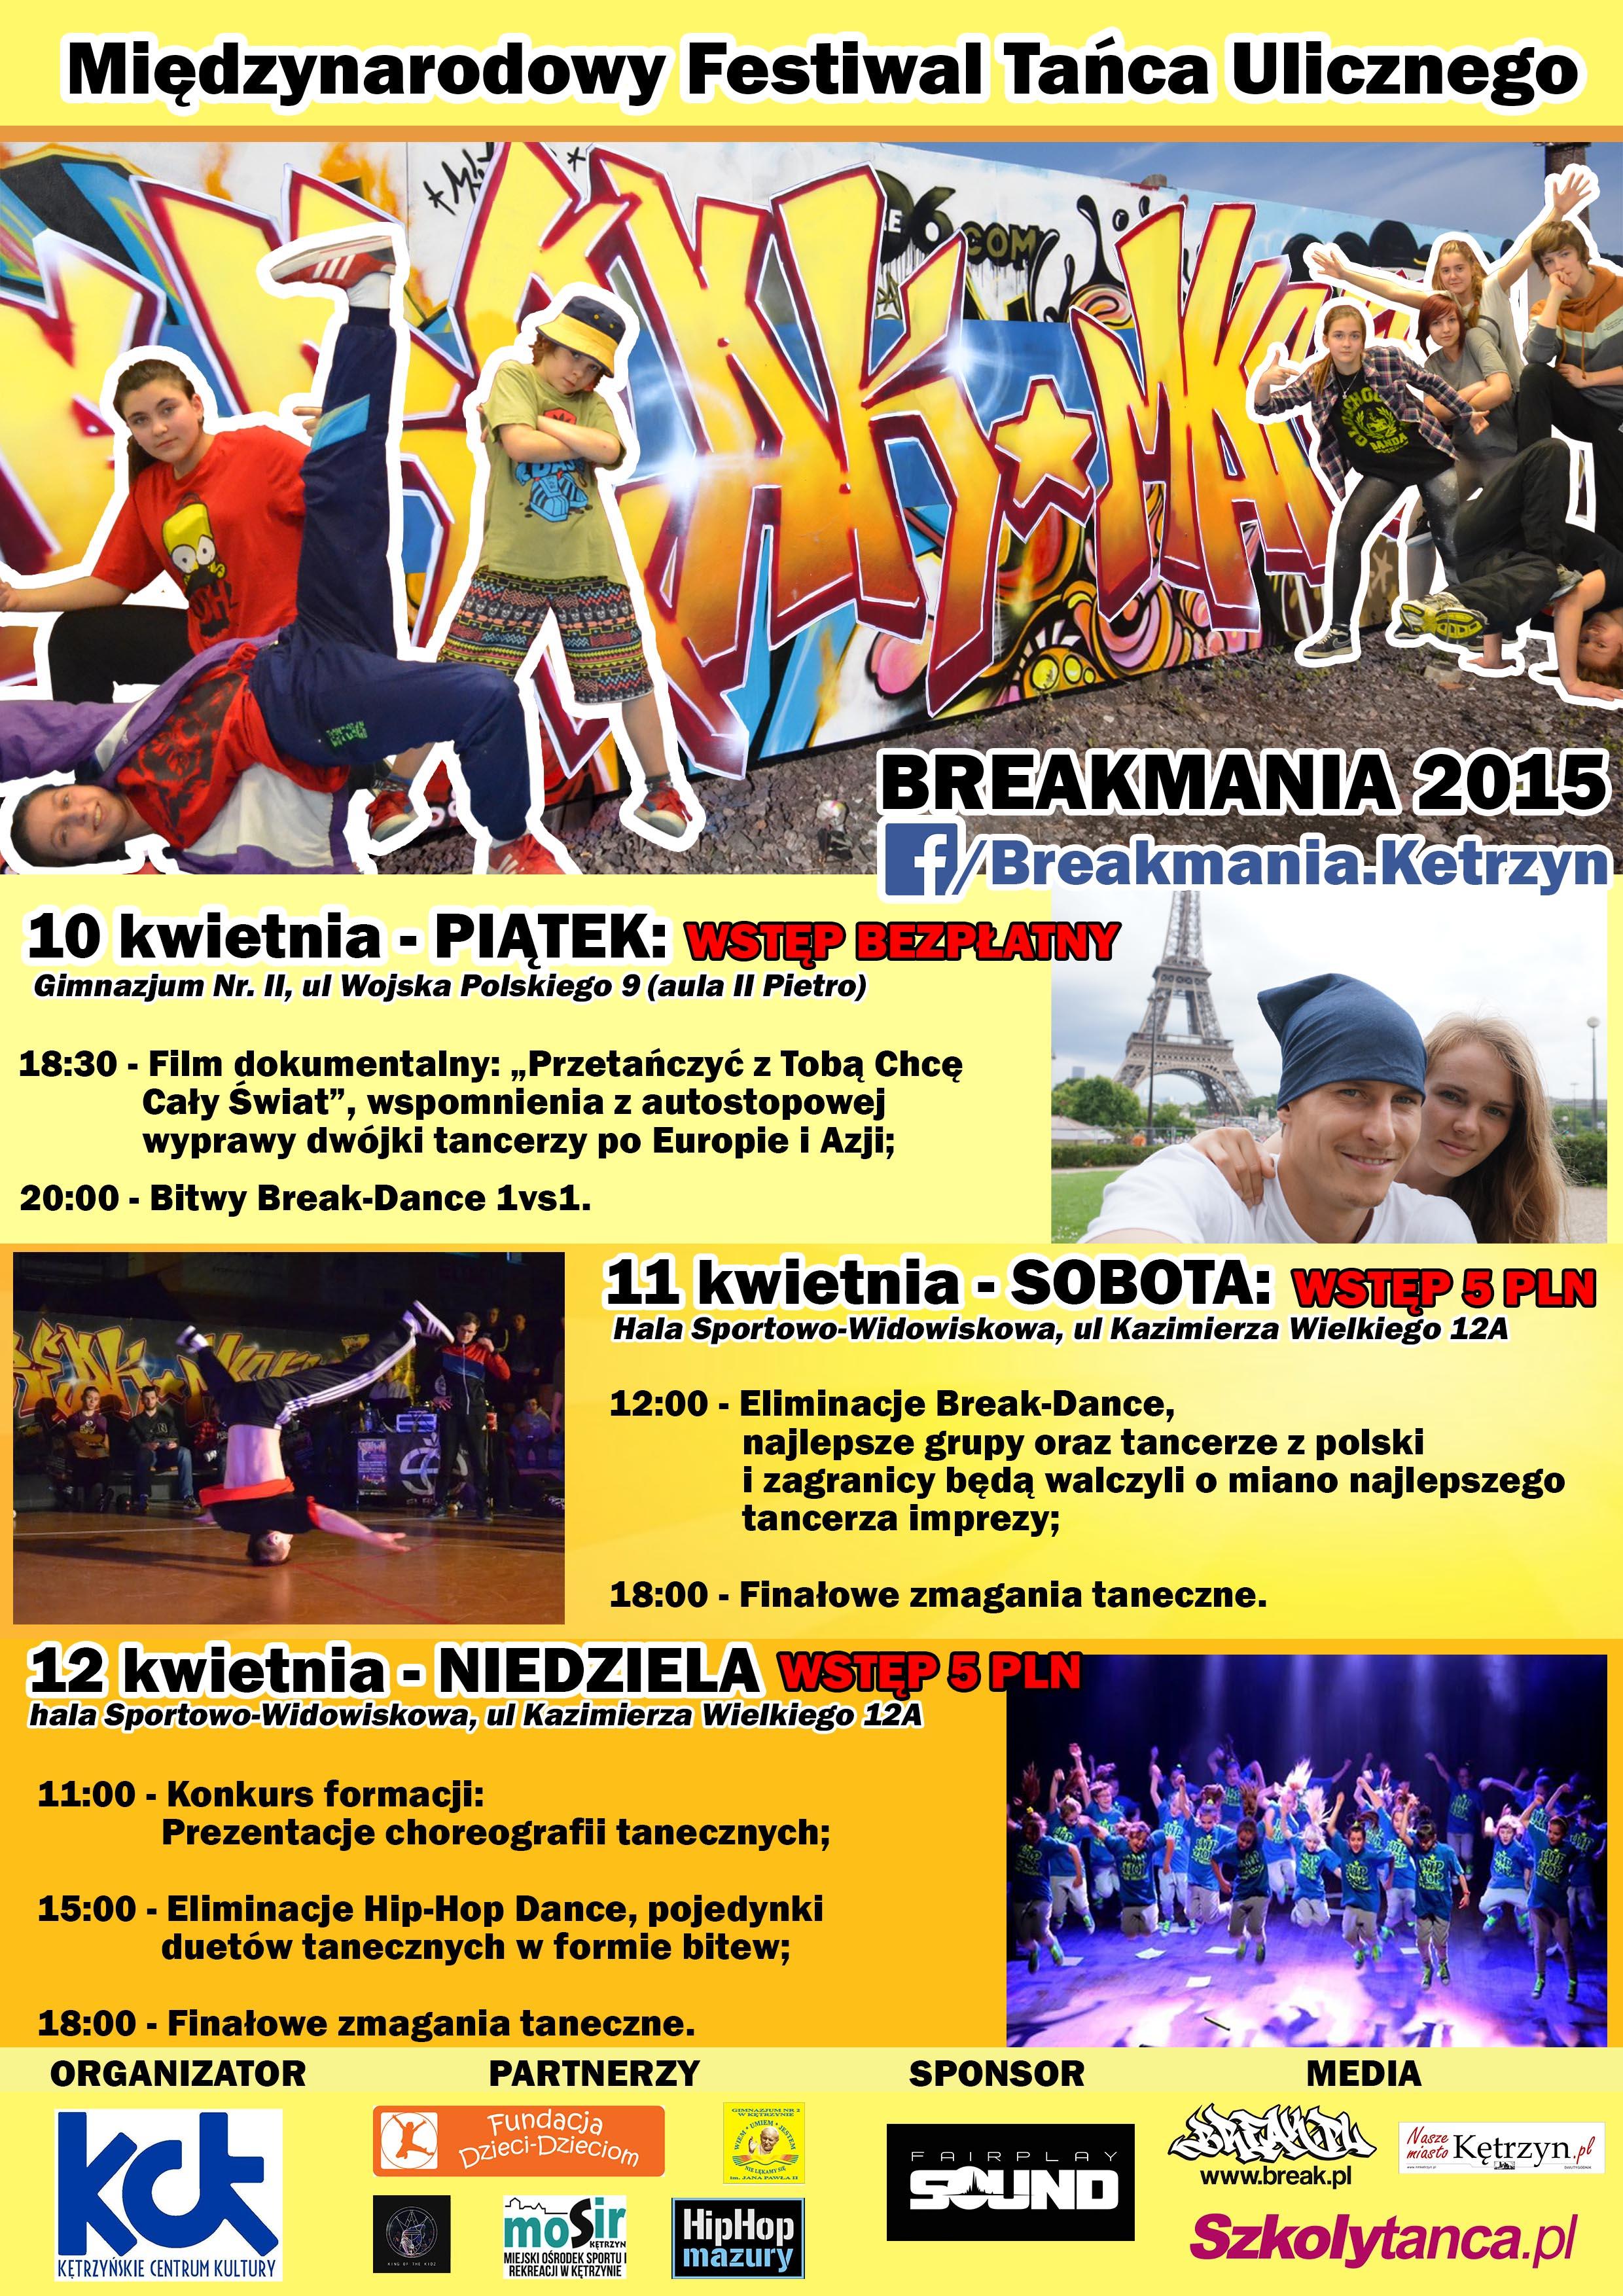 Breakmania 2015 - Oficjalny Plakat